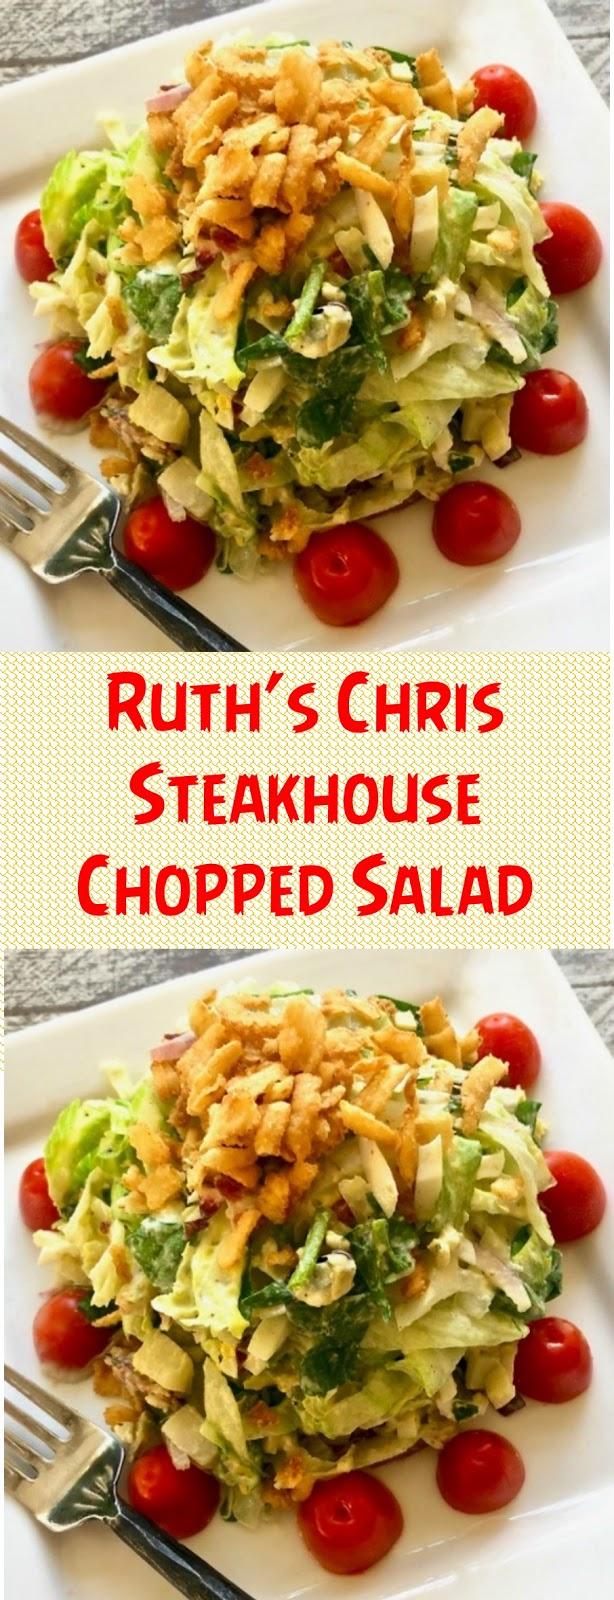 Ruth's Chris Steakhouse Chopped Salad